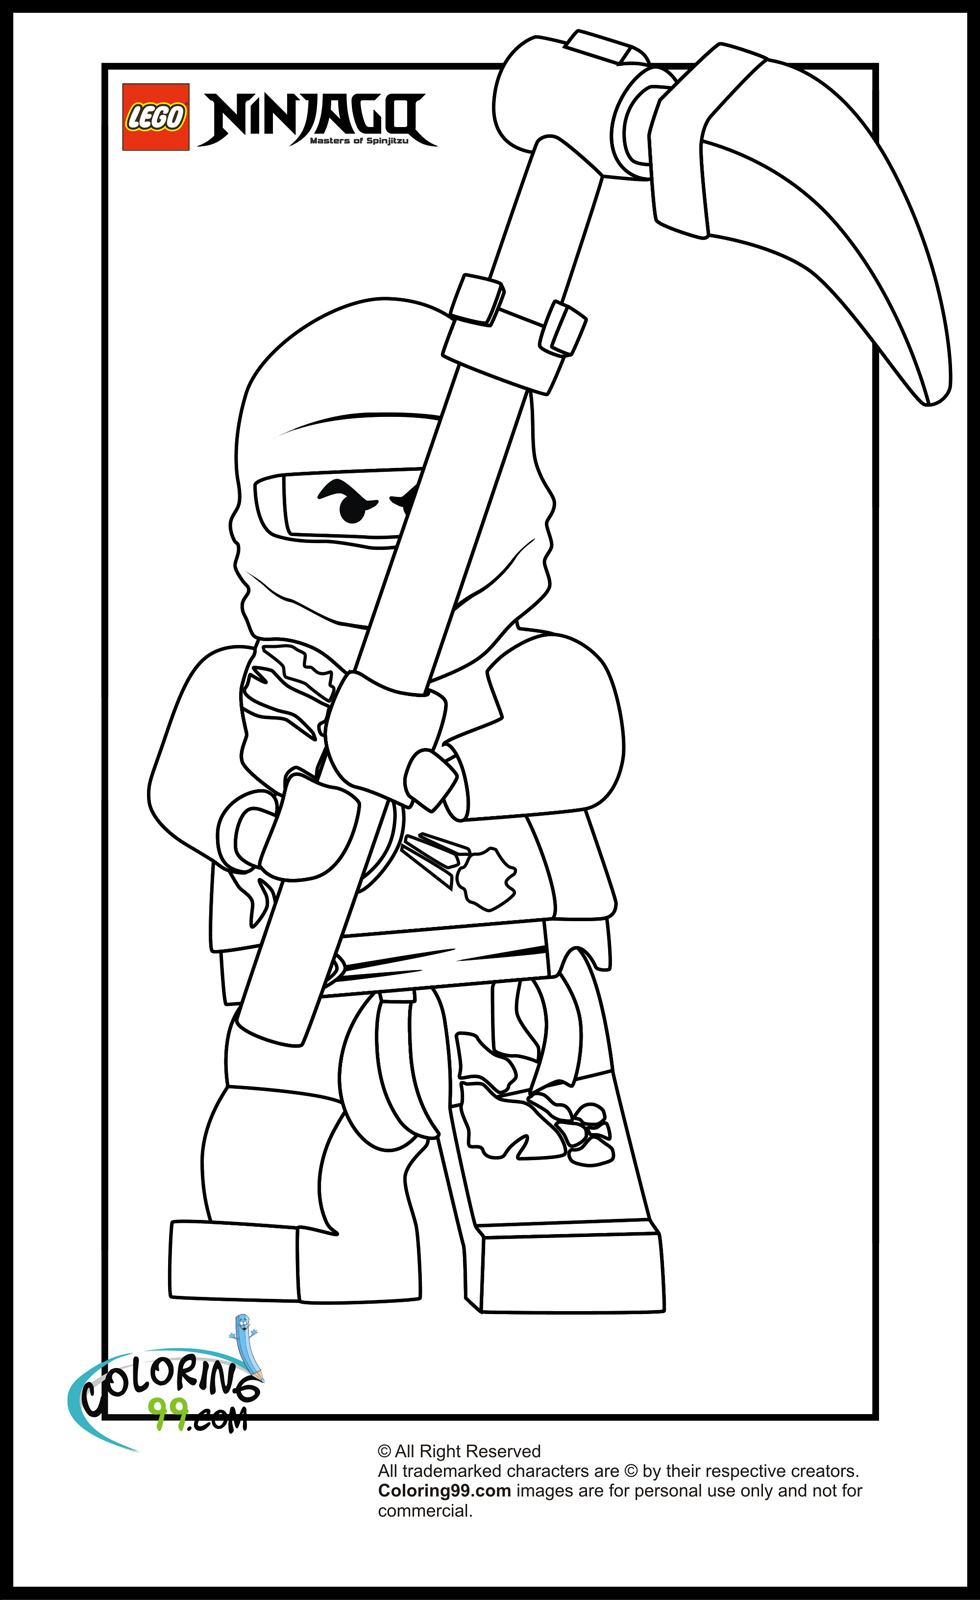 ninjago color lego ninjago coloring pages fantasy coloring pages ninjago color 1 2